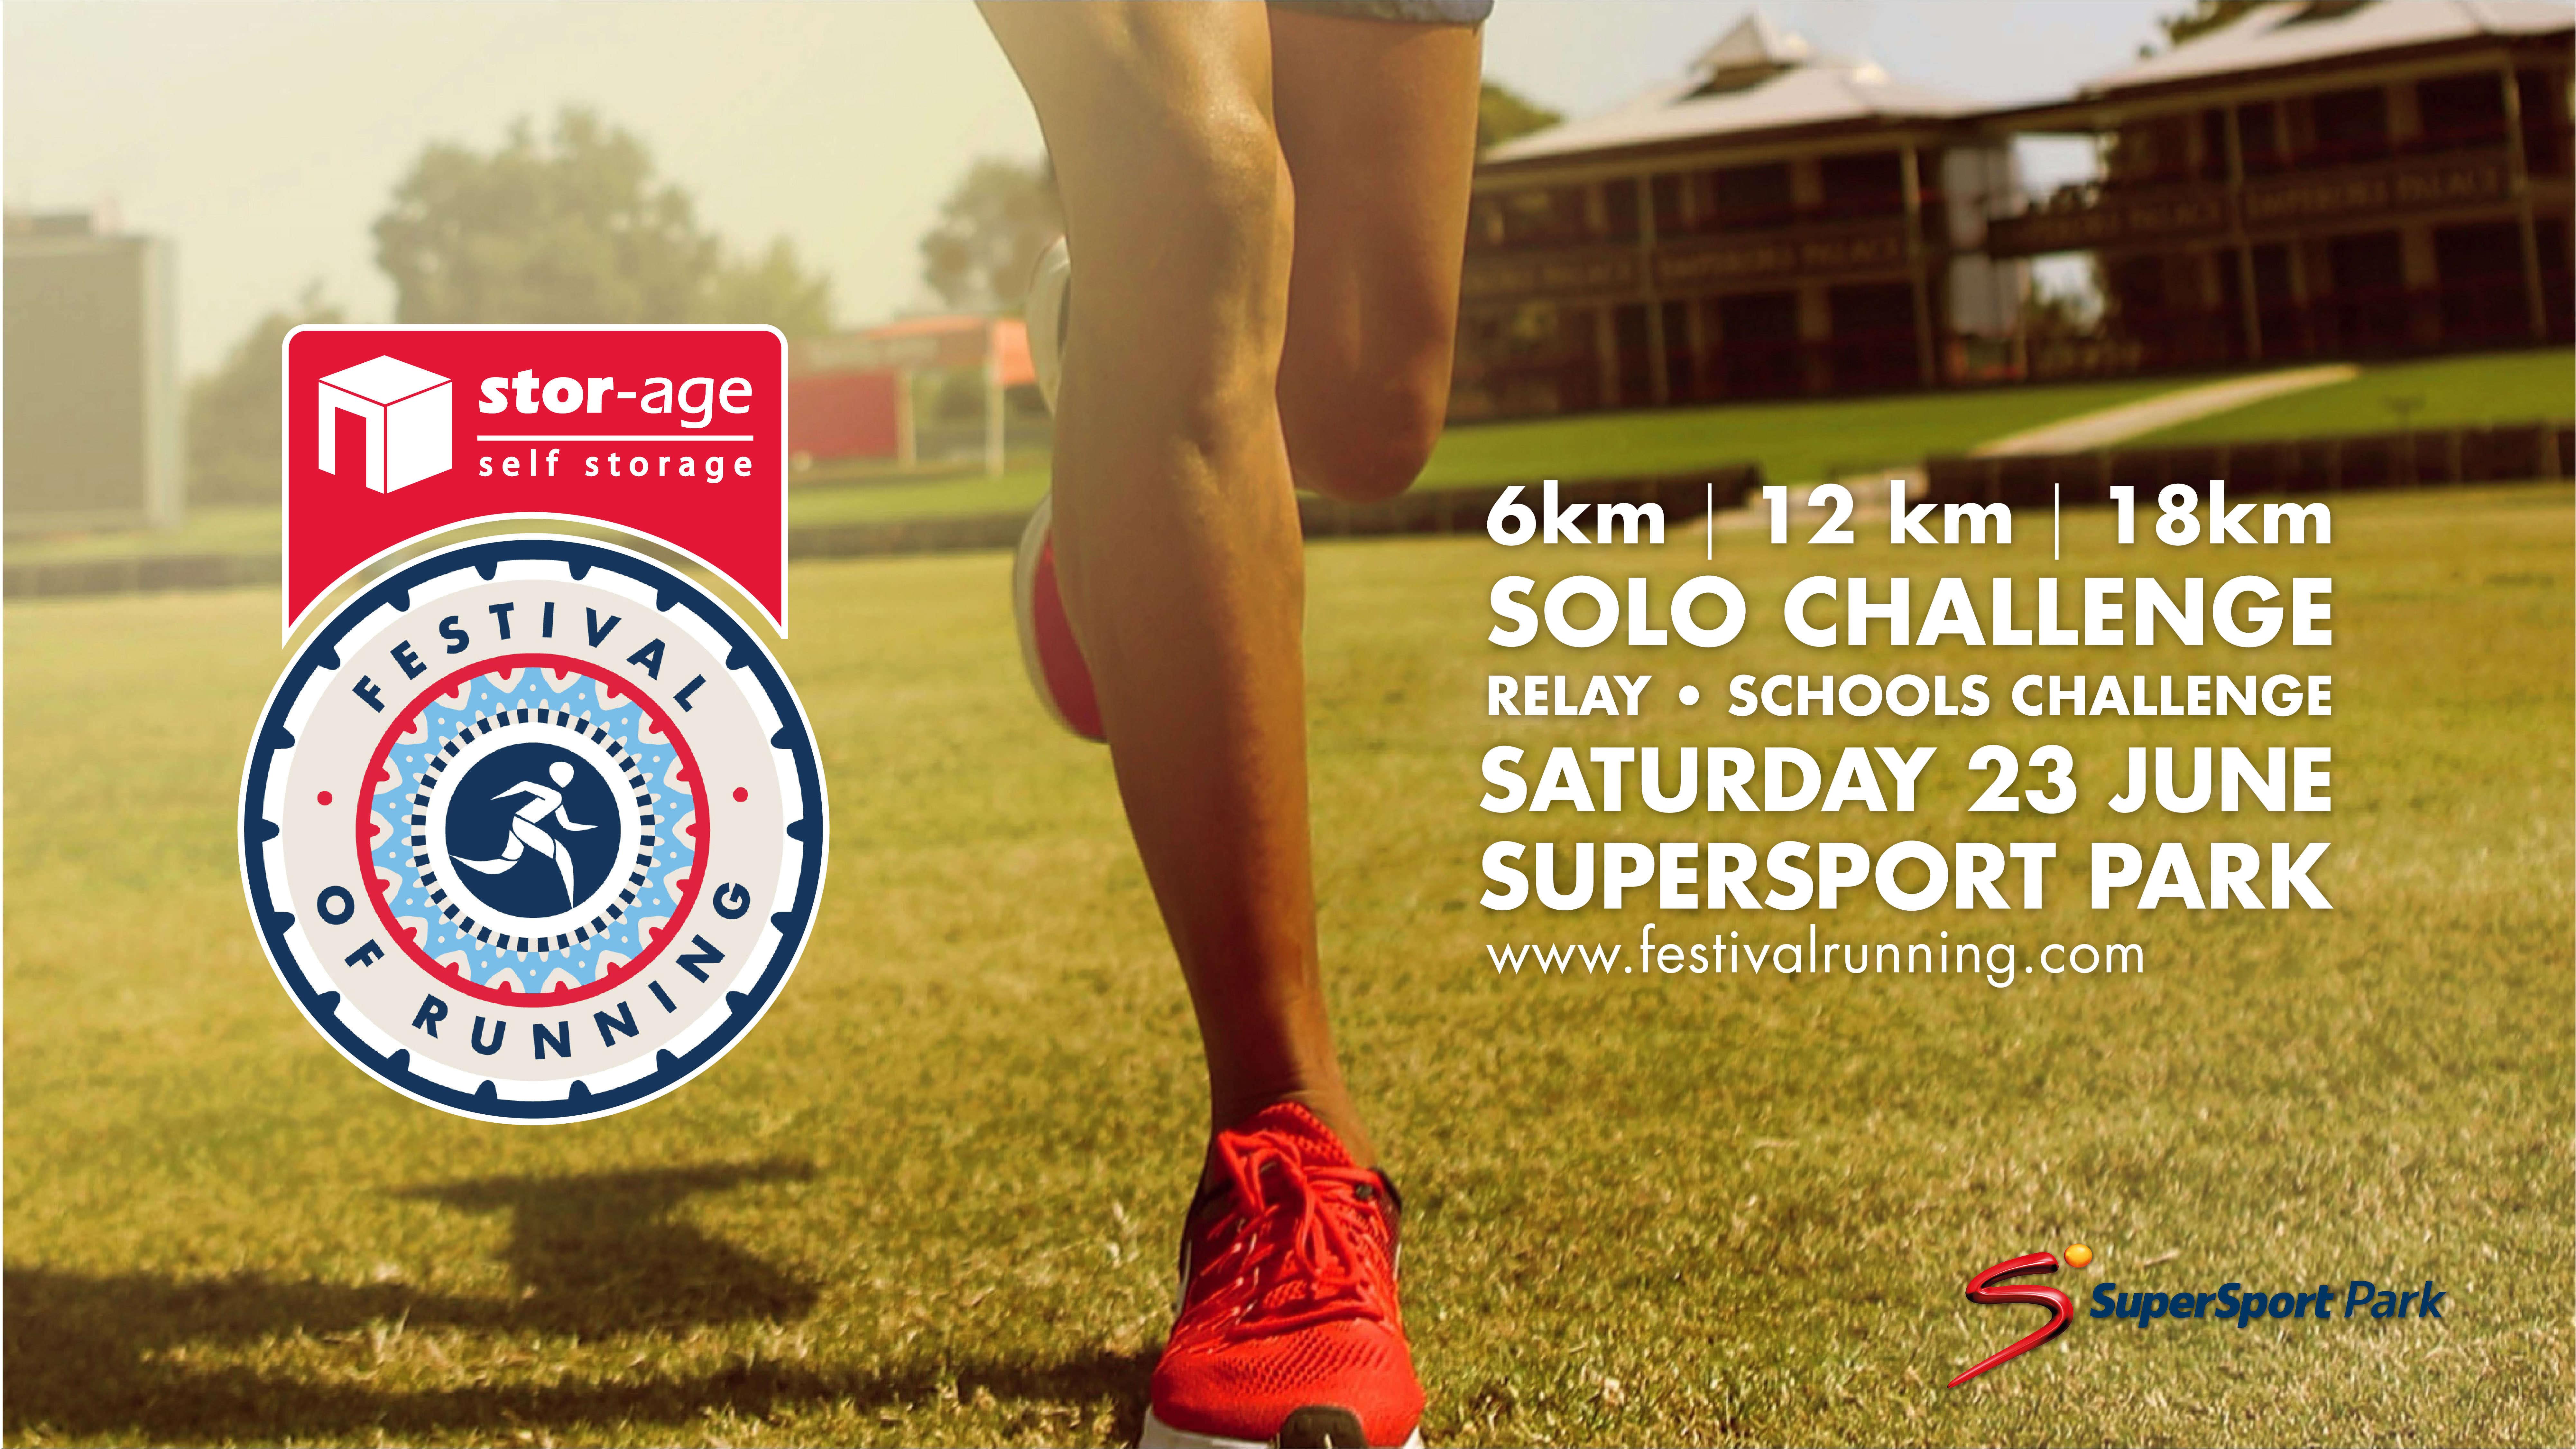 Stor-Age Announces Title Sponsorship of Festival of Running